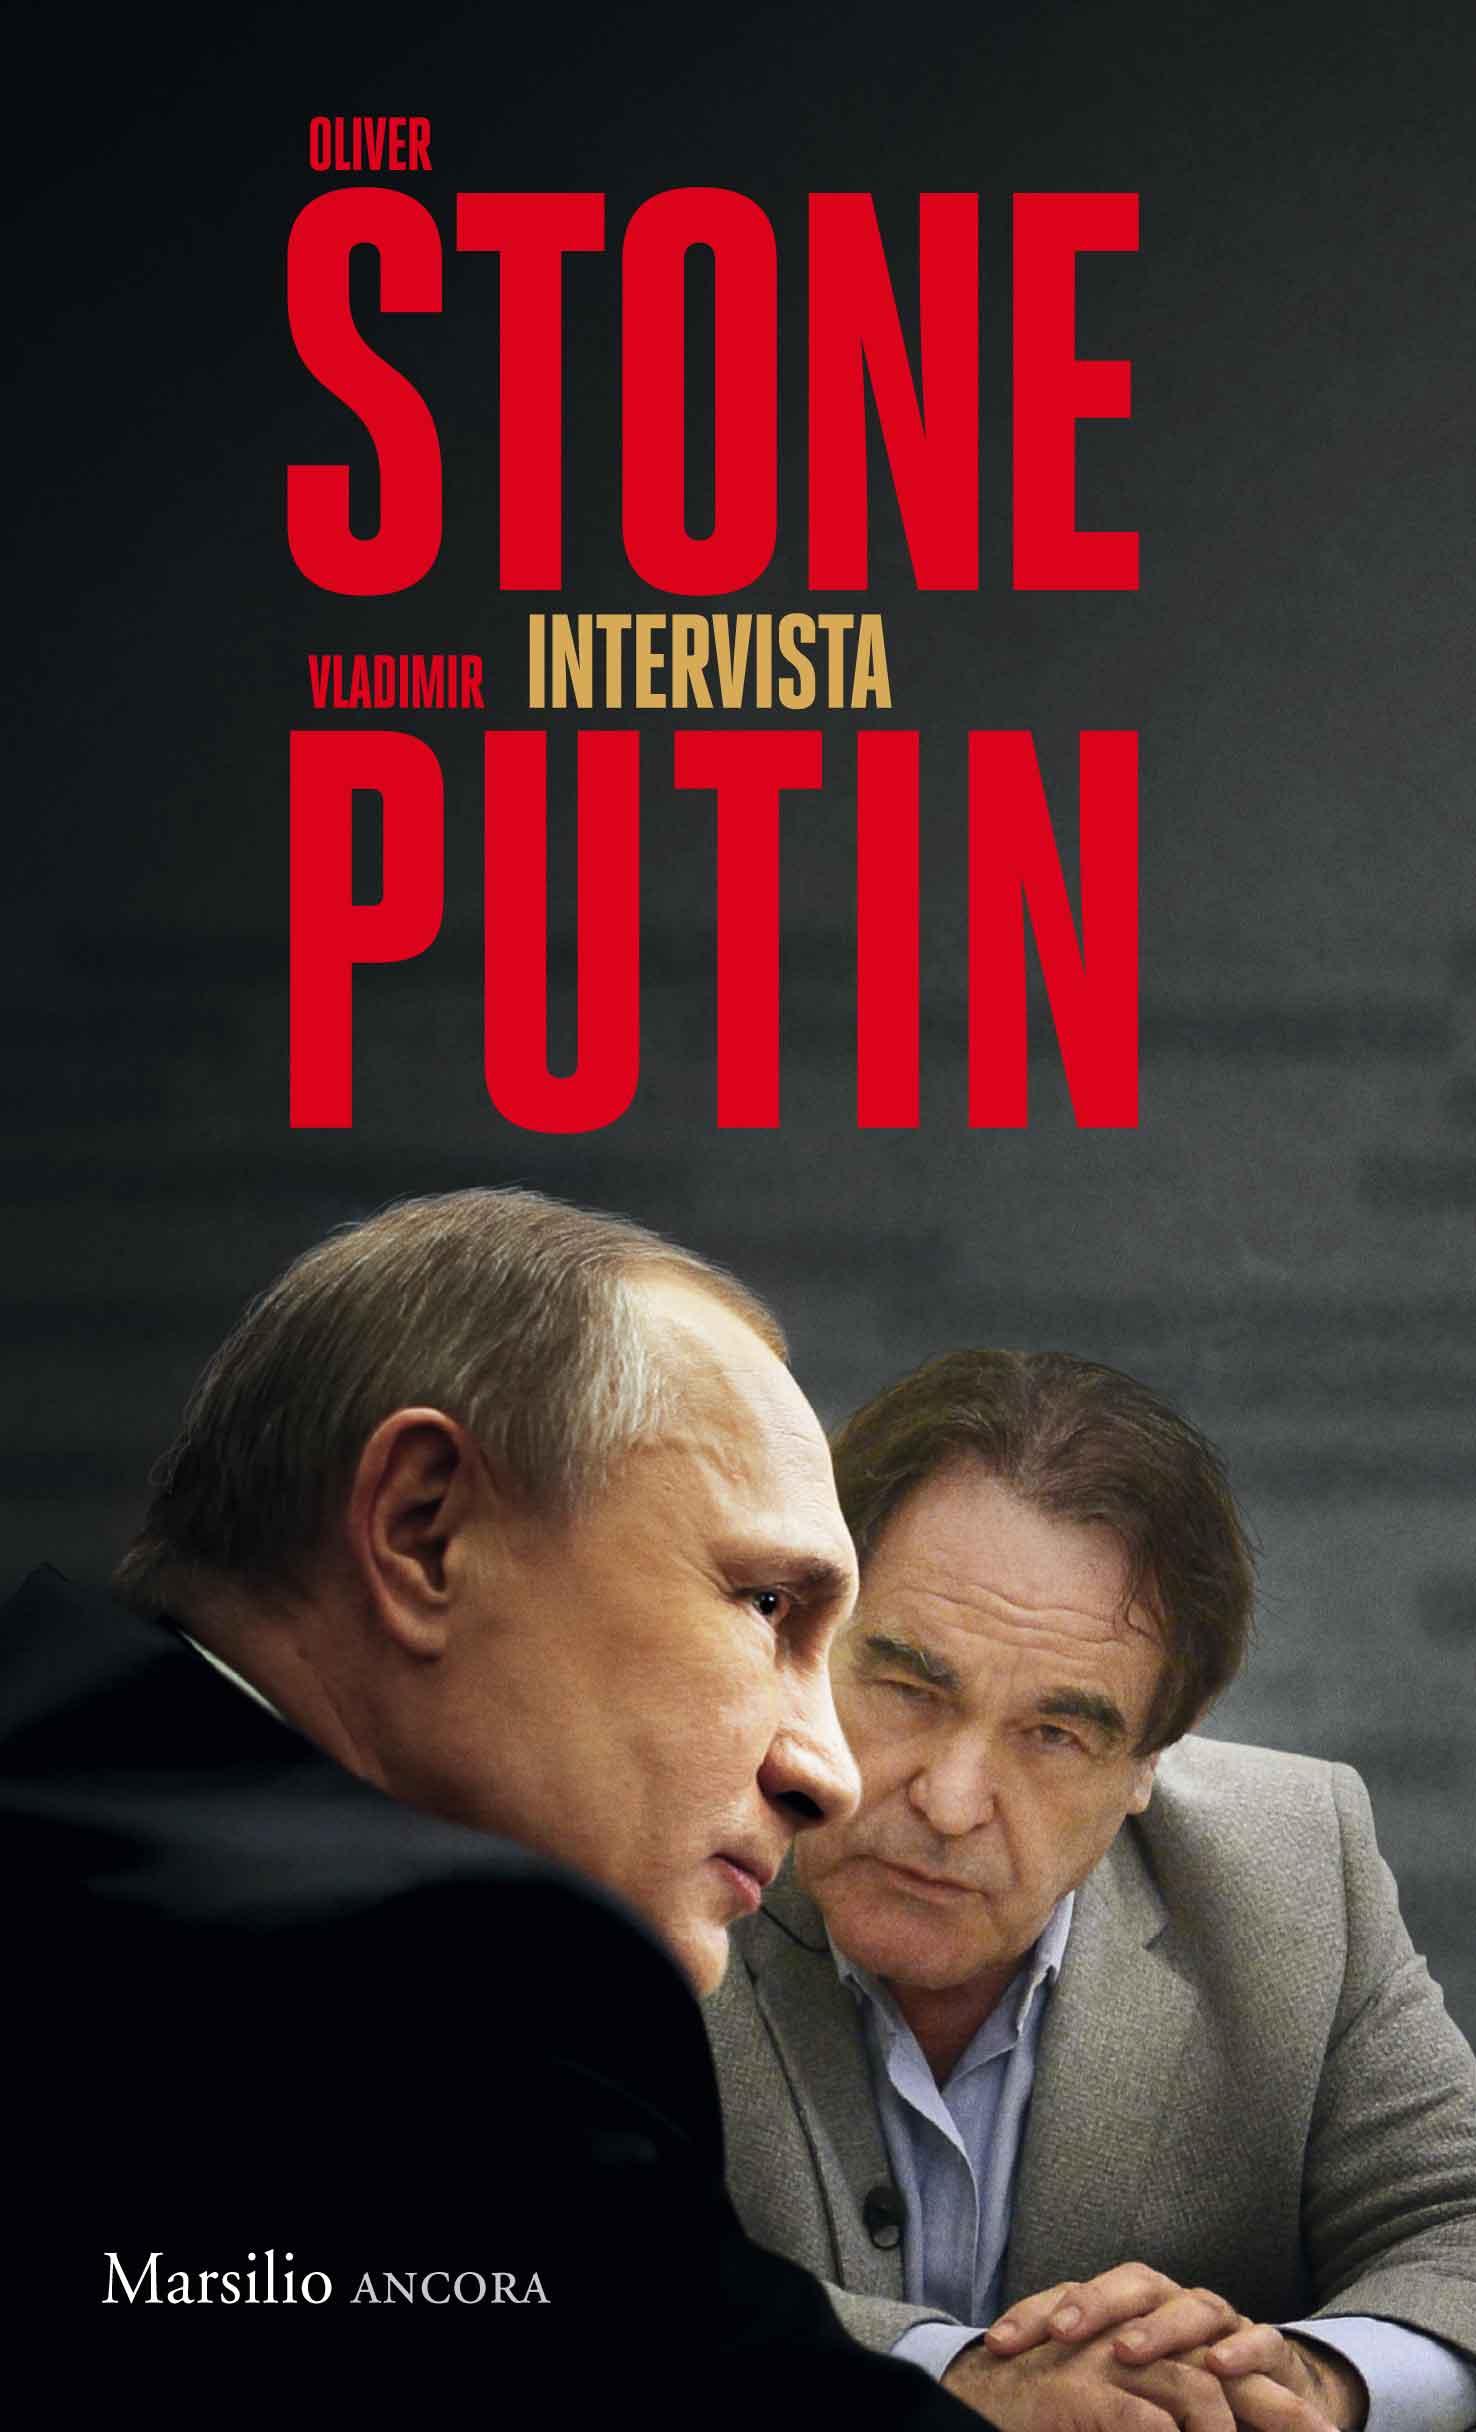 Oliver Stone intervista Vladimir Putin